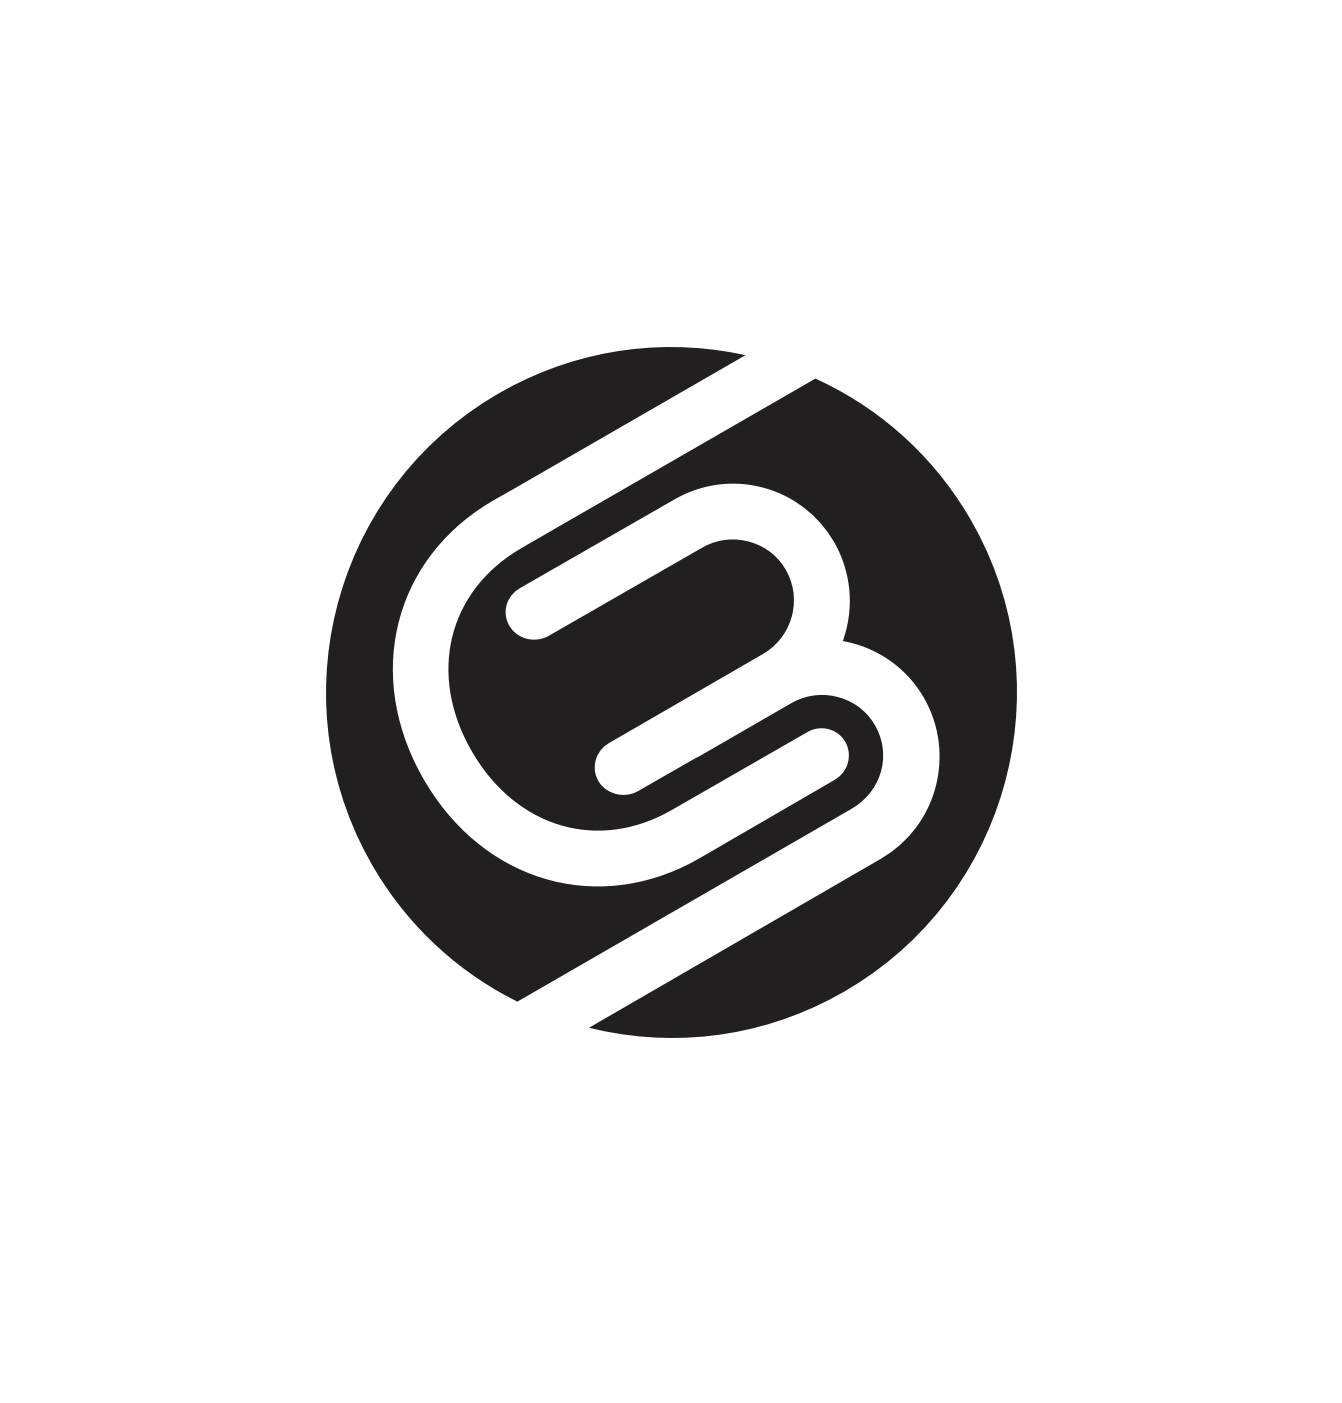 Logo-1-3